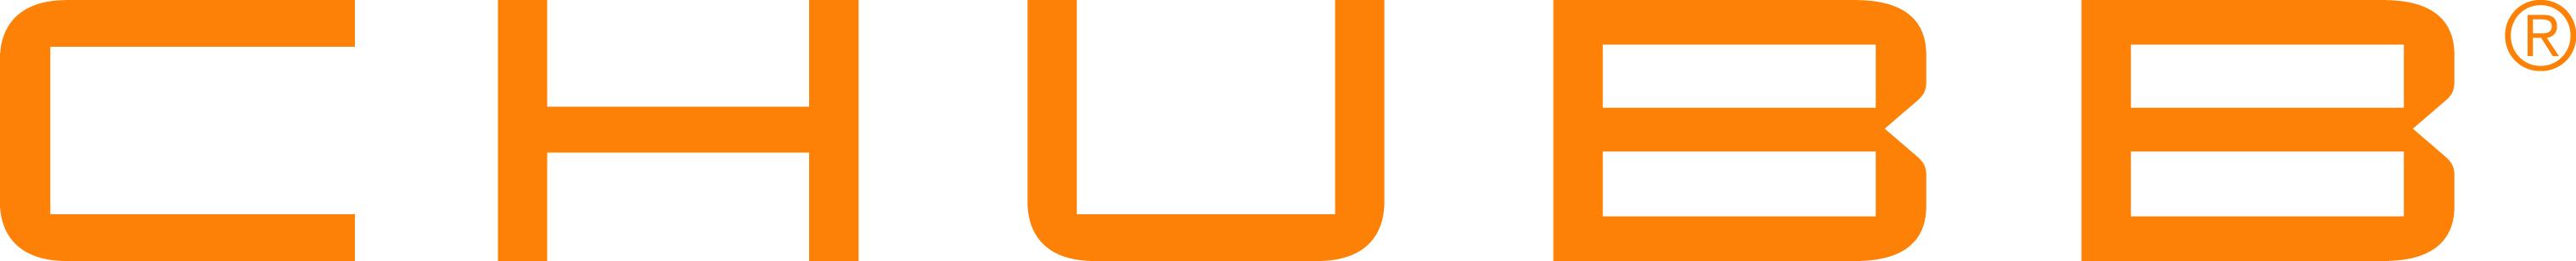 Chubb Uk Regional Newsroom Chubb Logos